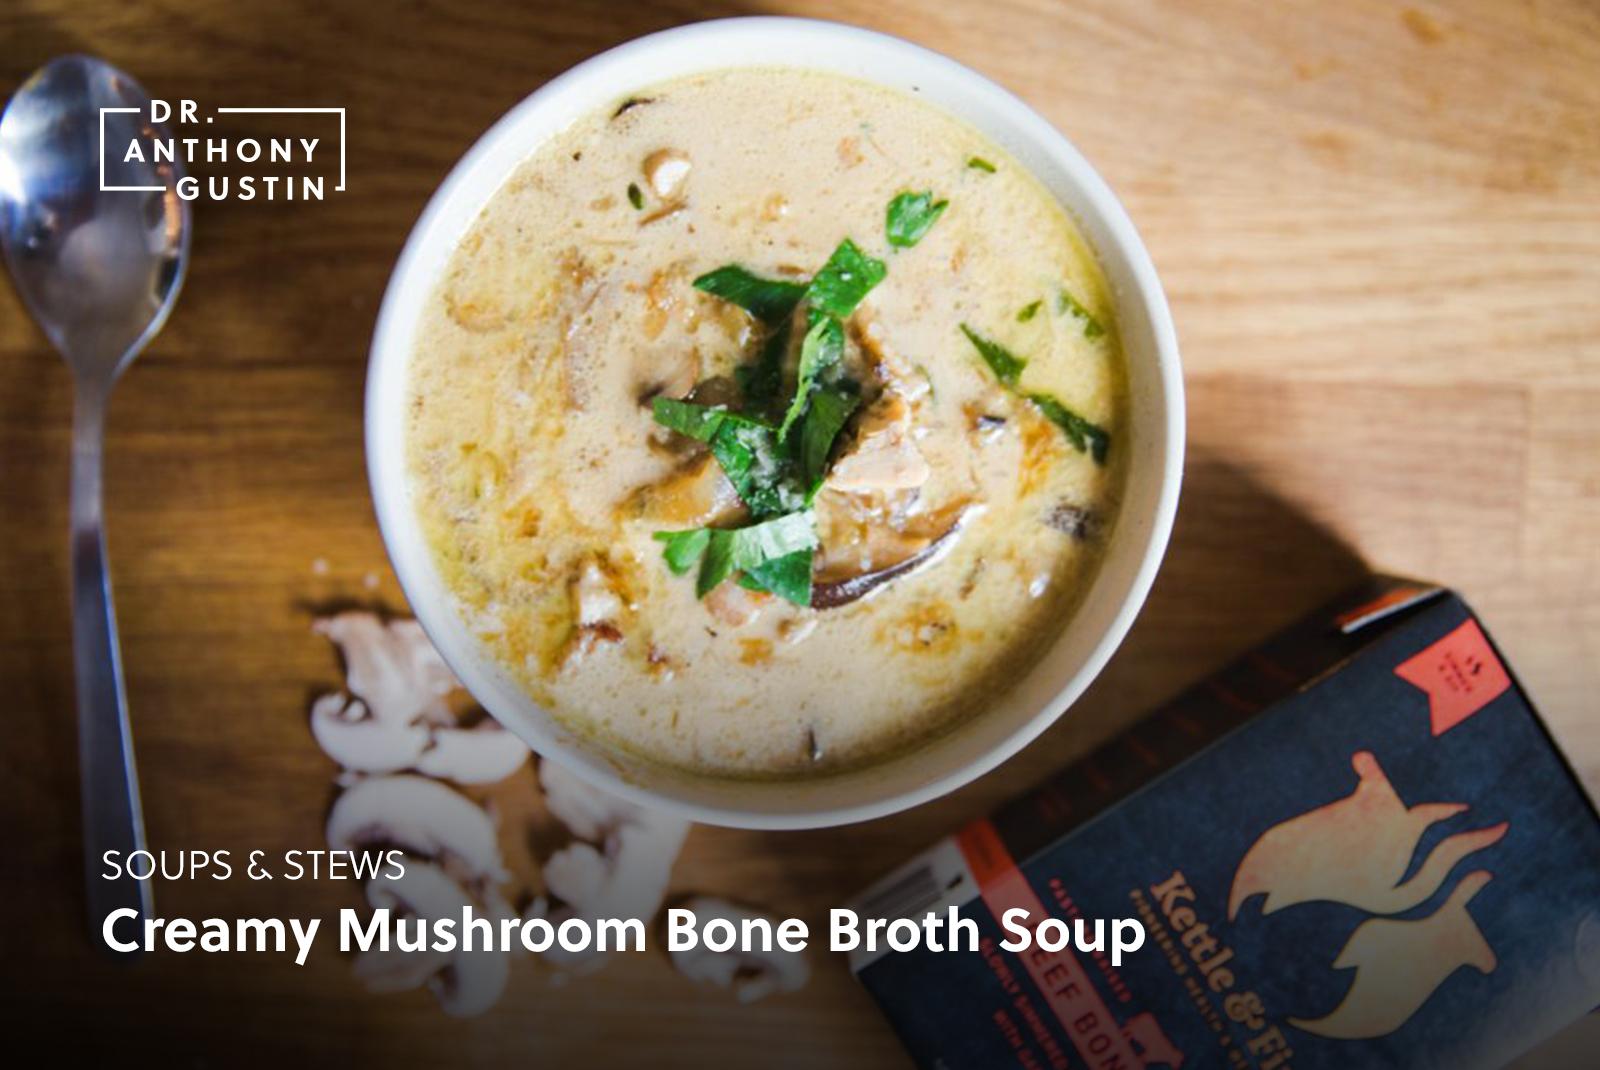 Creamy Mushroom Bone Broth Soup